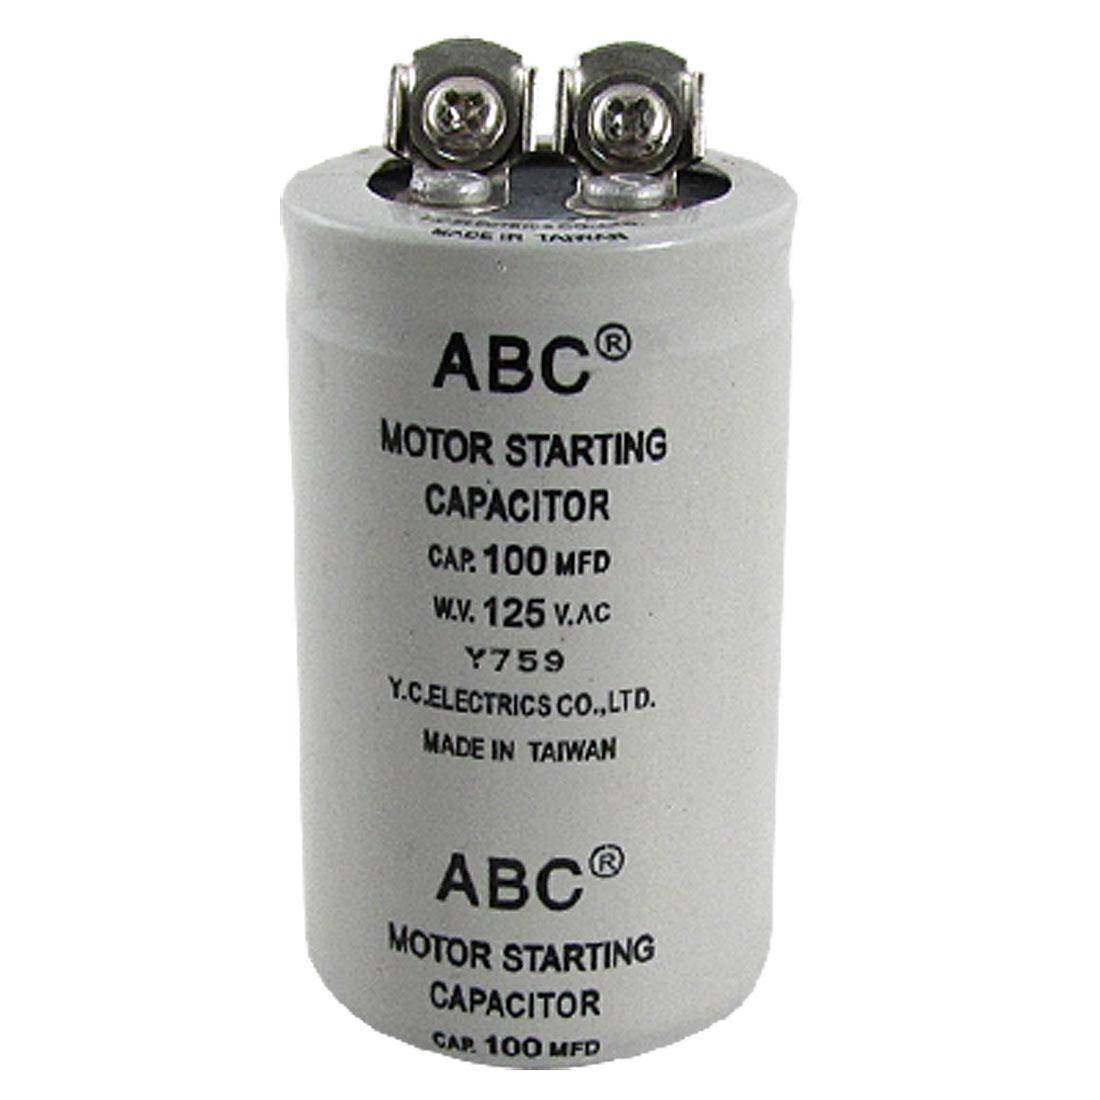 Cylinder 100MFD 125V AC Motor Starting Capacitor